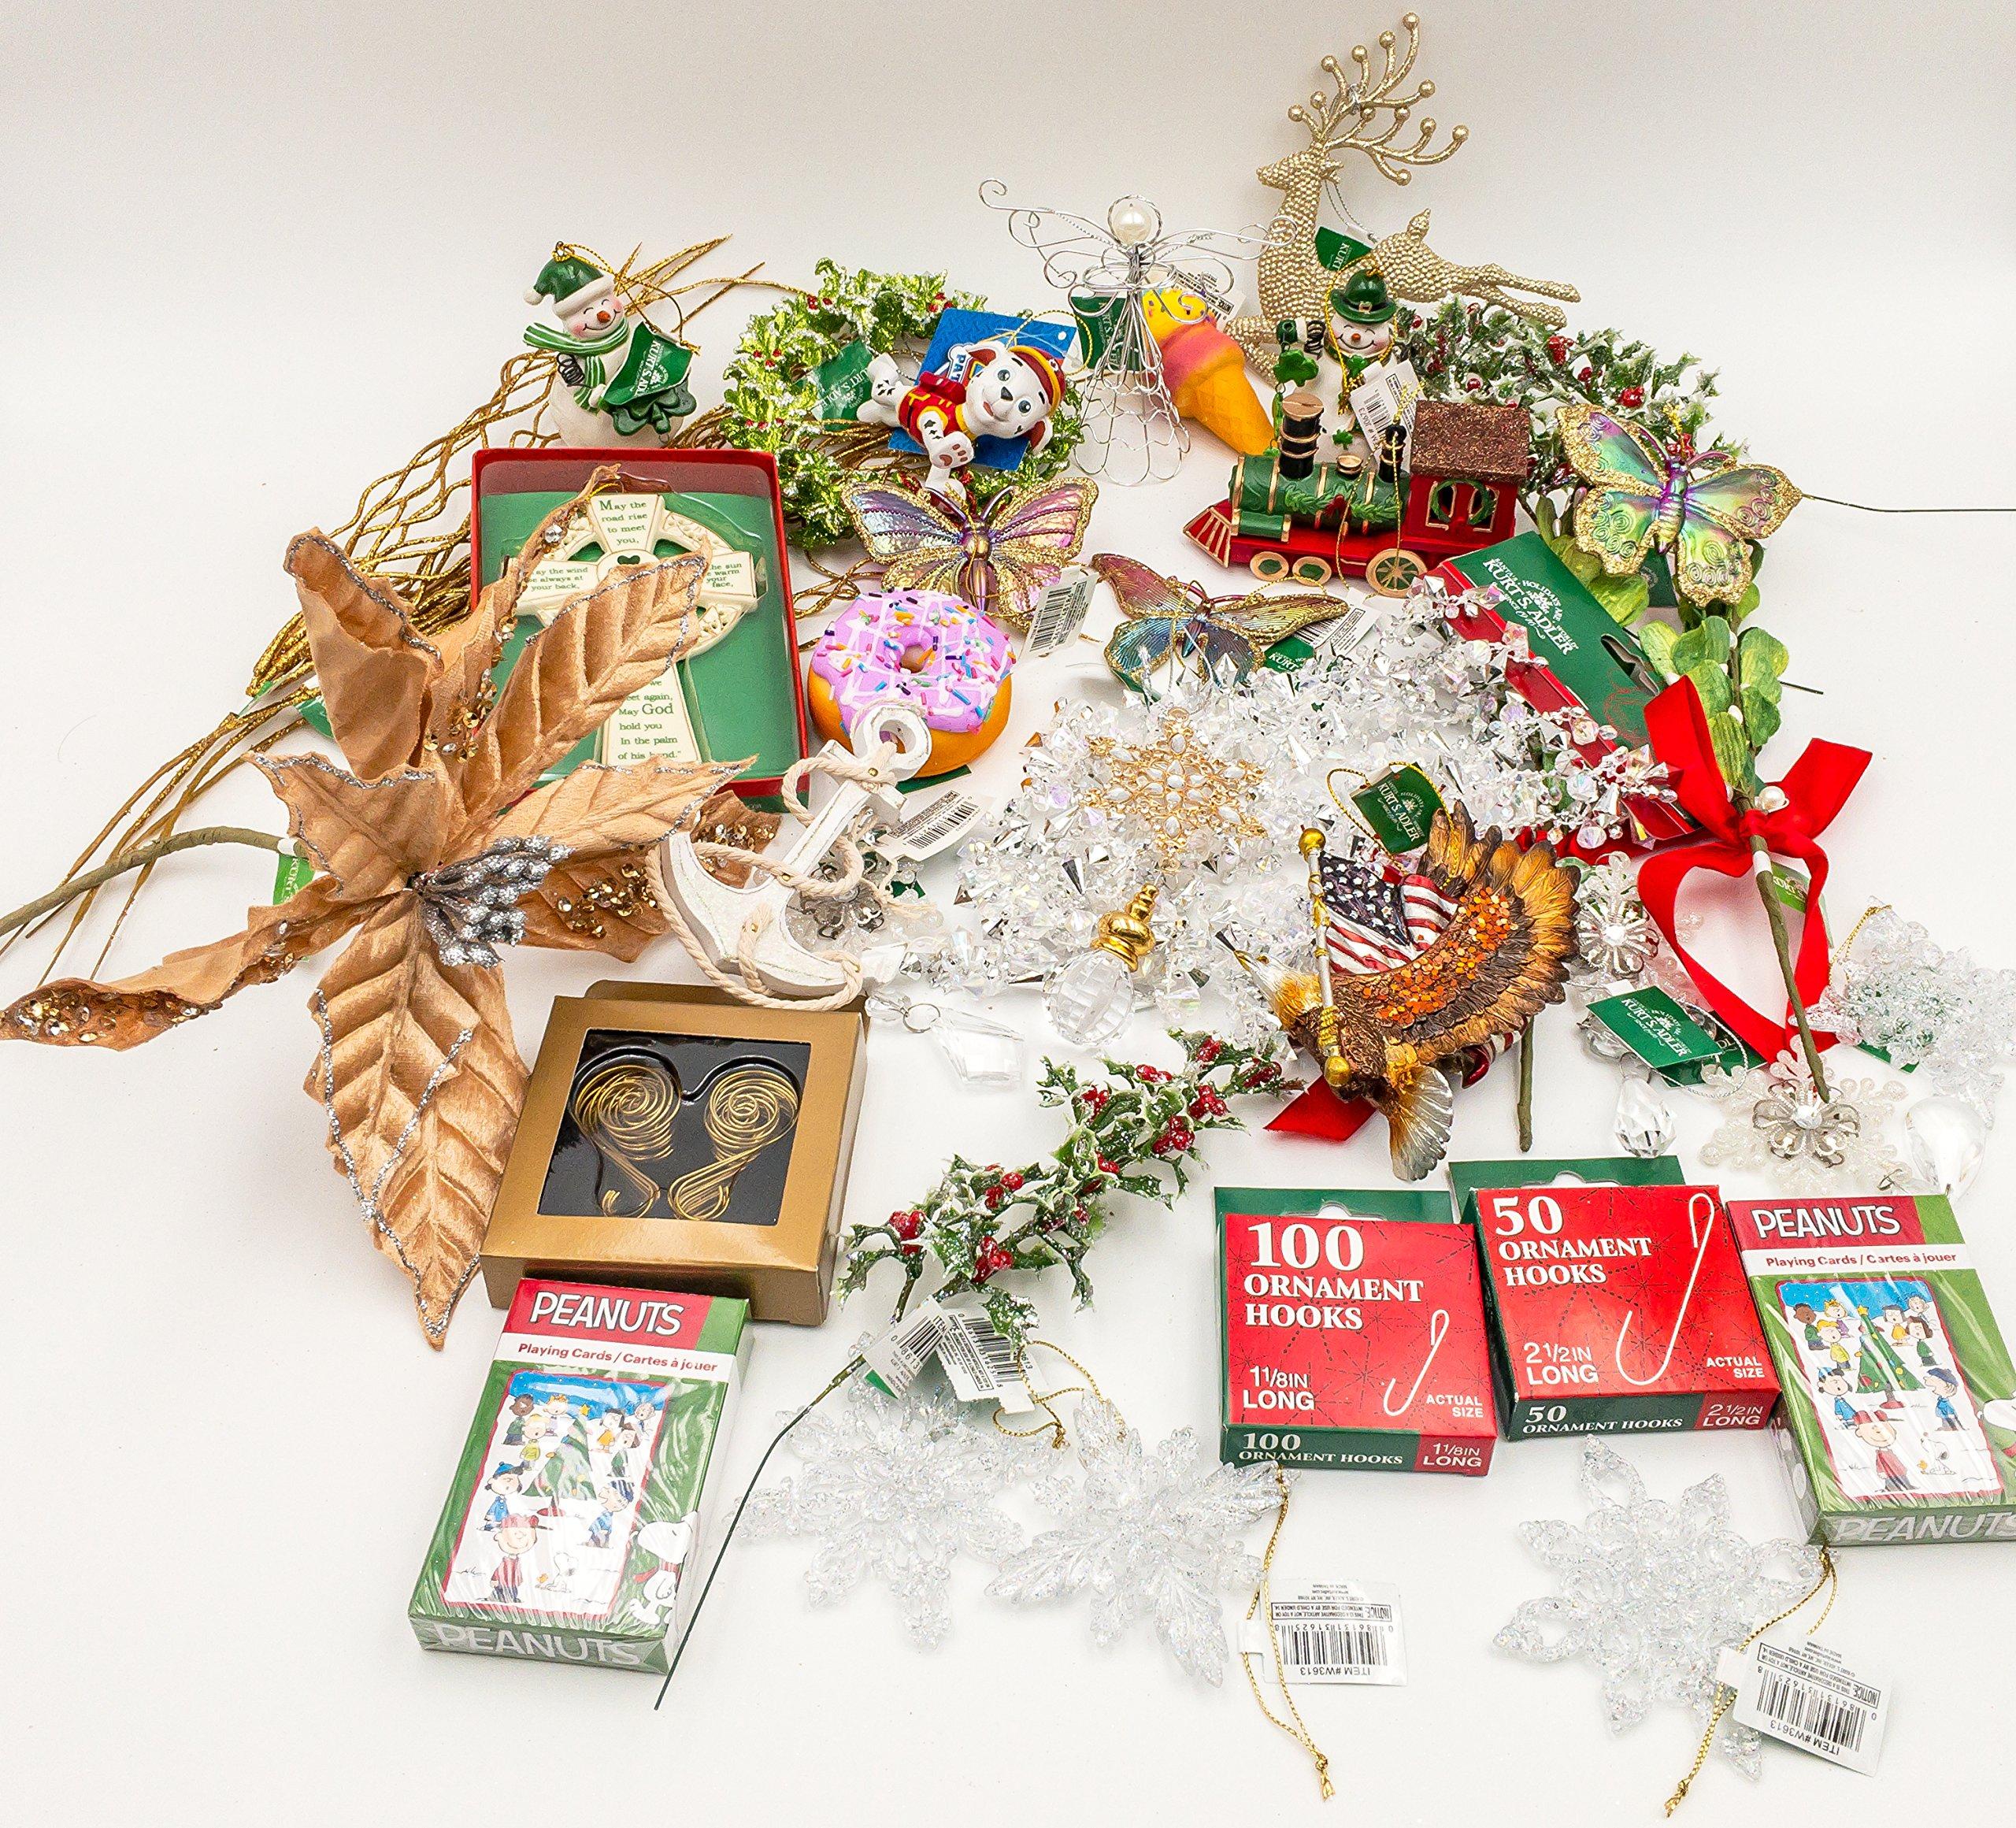 JZ Bundles Starter Set - Best of Christmas Option C - Kurt Adler - 37-Piece Bundle - A Bundle of Christmas Ornaments Great Gift by JZ Bundles (Image #1)